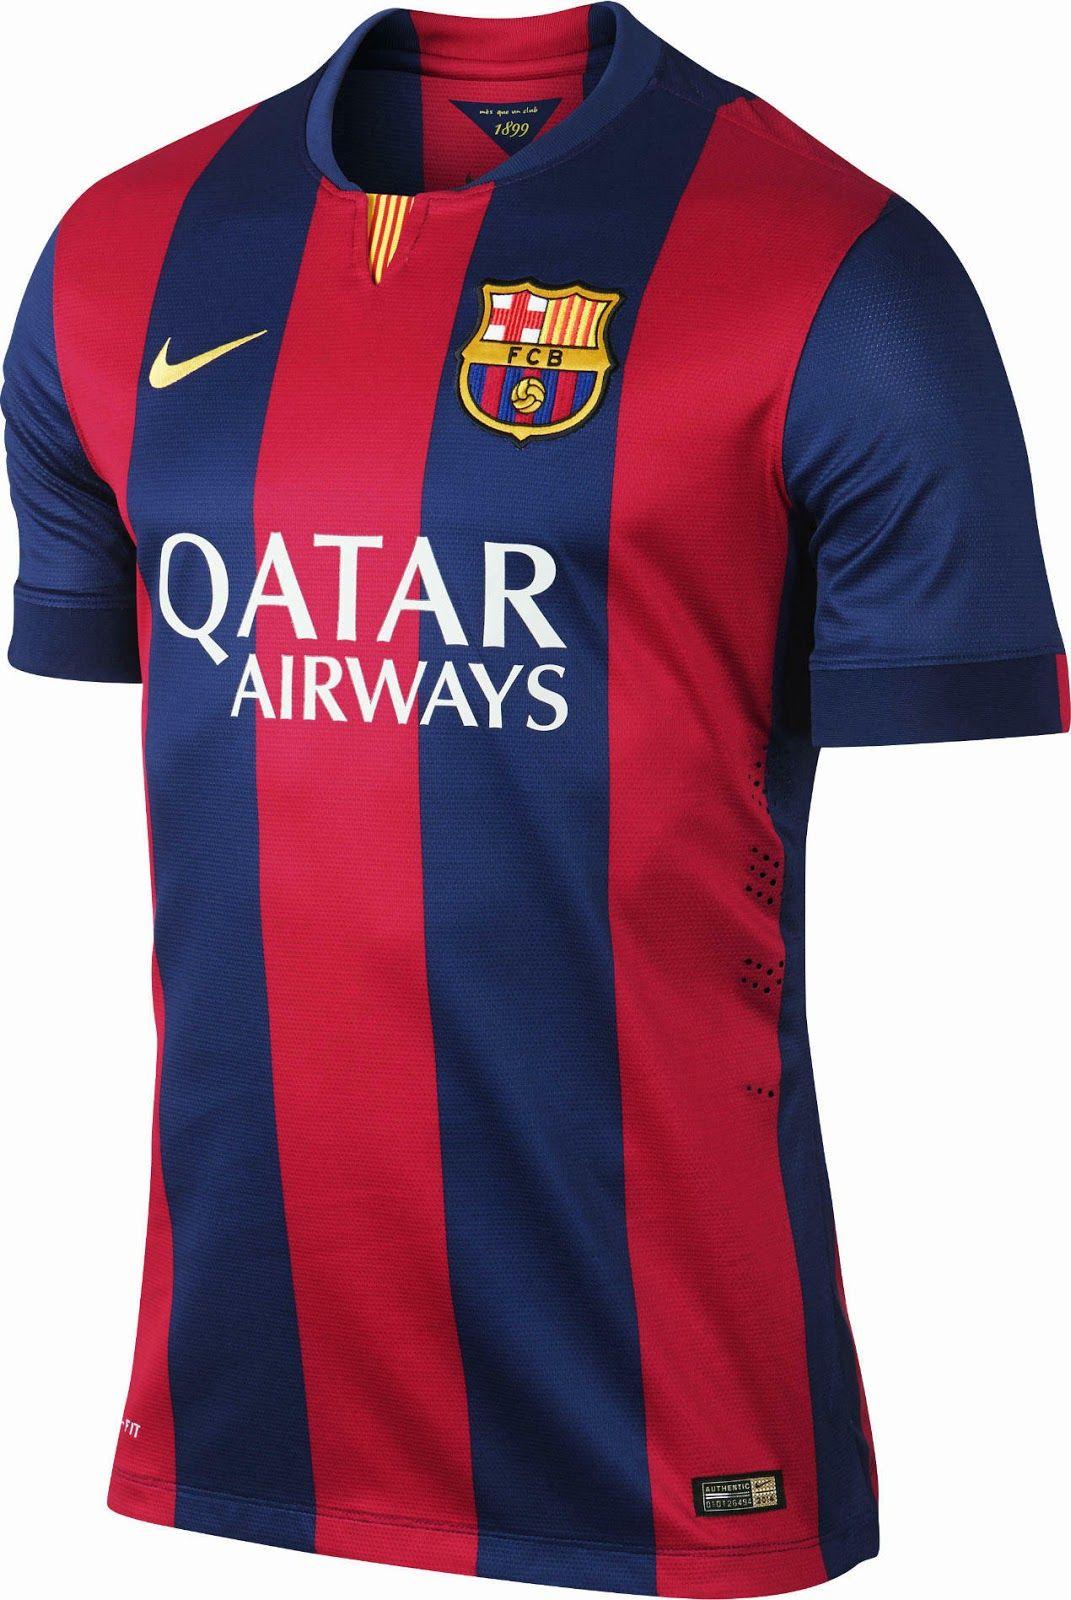 02f6c1f169 Pin de La Mano de Dios en F.C.Barcelona Camisetas 2015